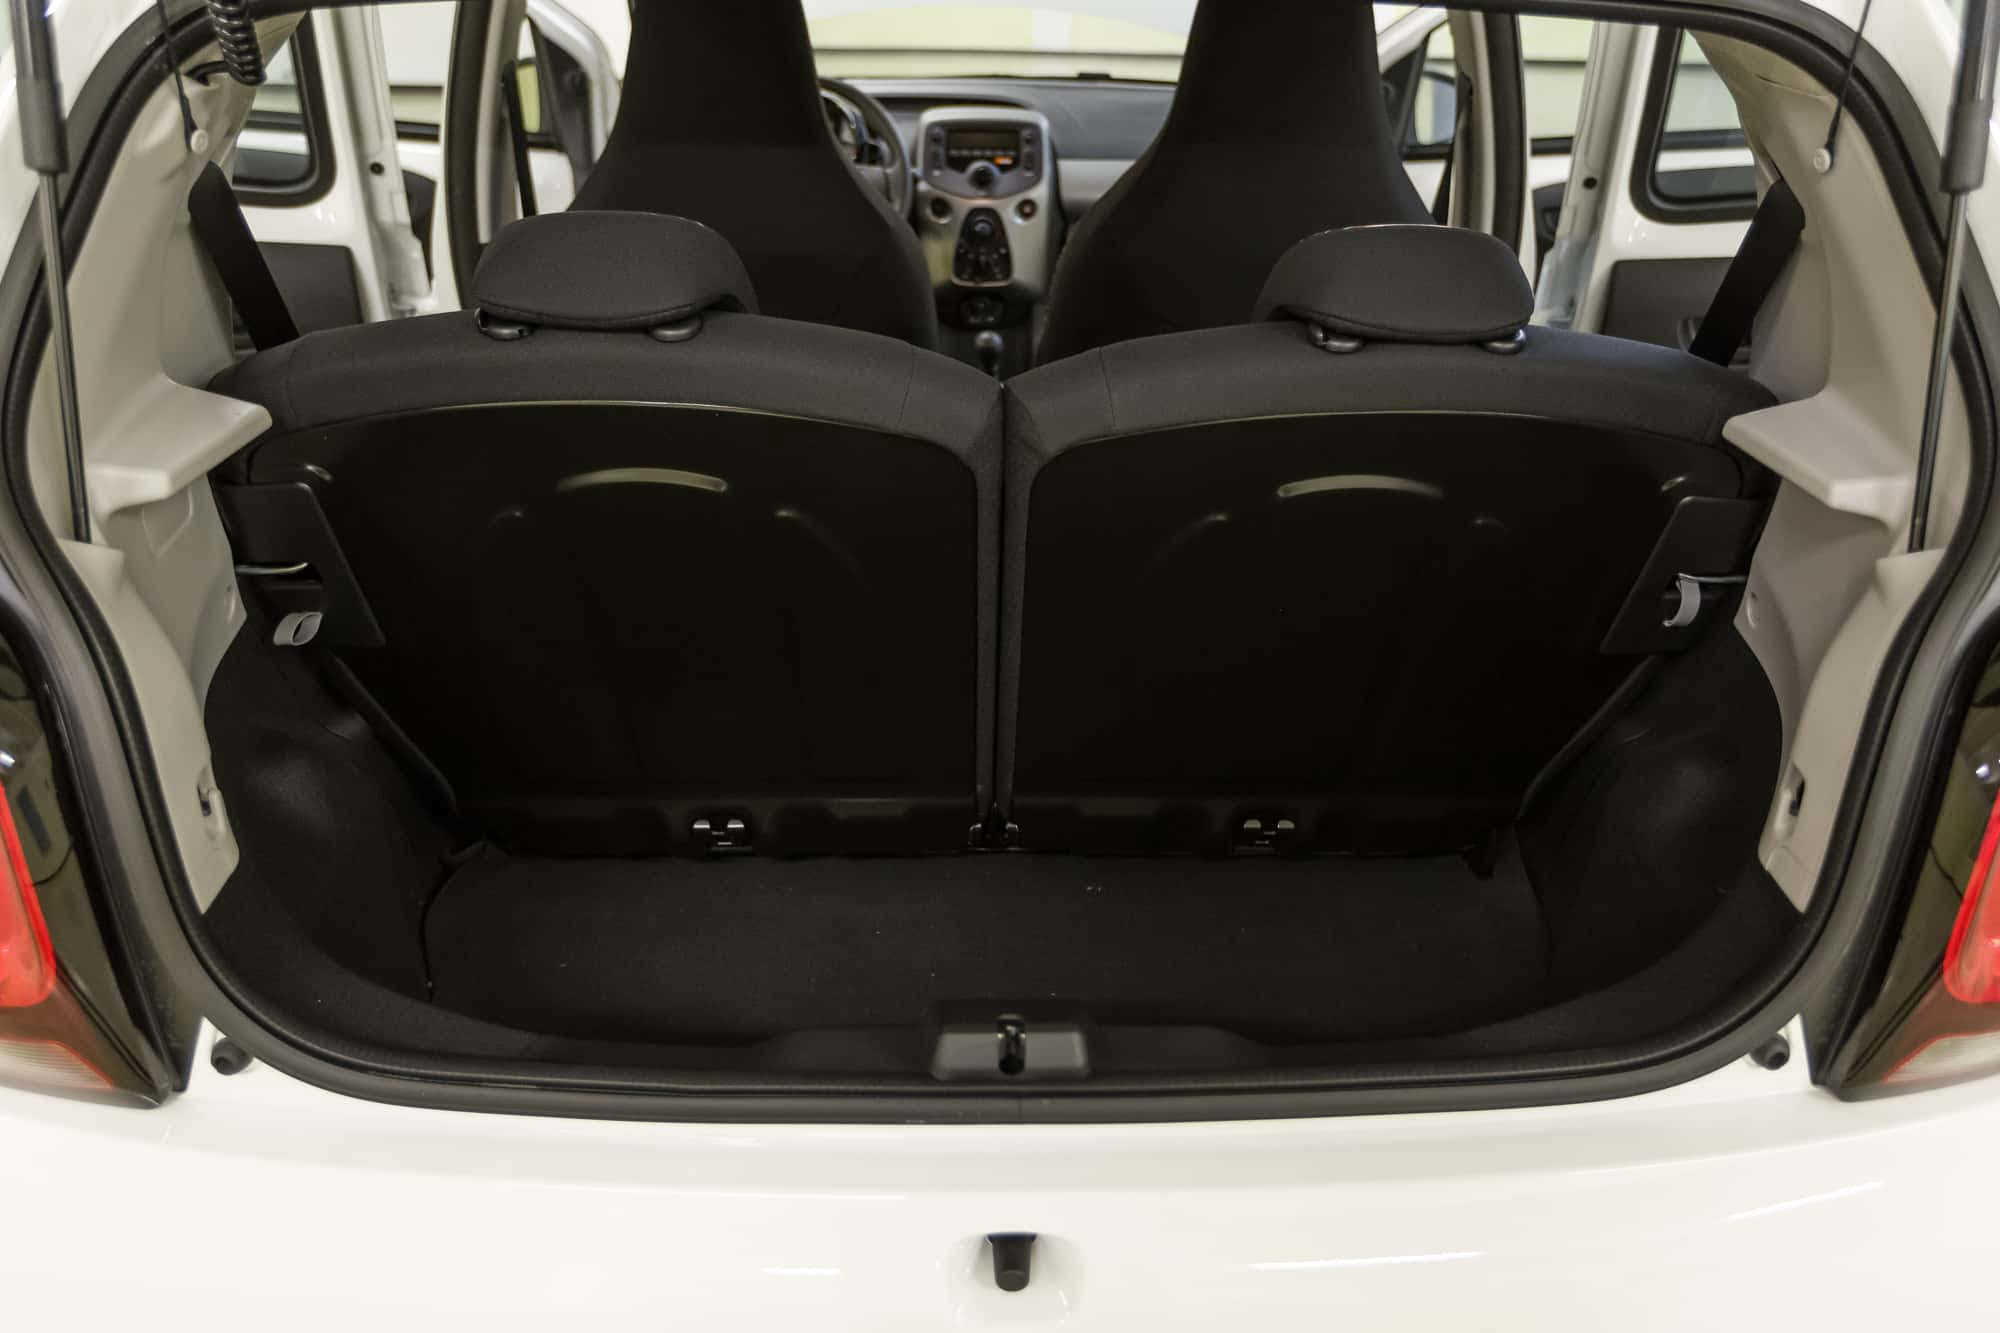 Citroen Interni C1 Vti 68 5 Porte Feel Bianco km0